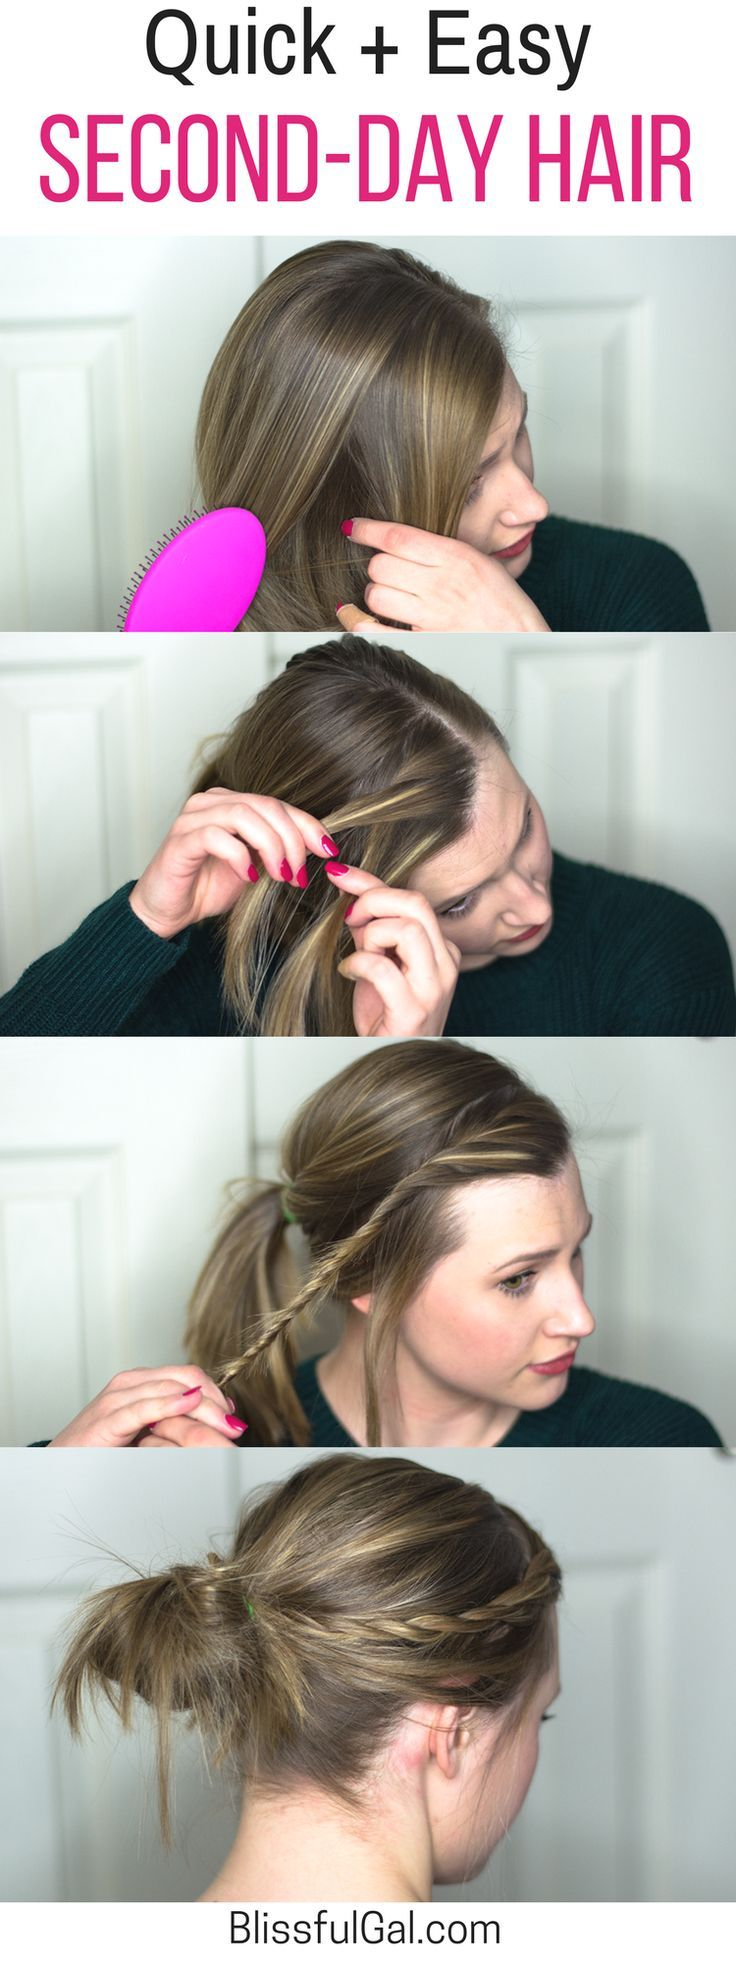 Einfache Frisur des zweiten Tages - faules Mädchenhaar ,  #des #einfache #faules #Frisur #frisuren #kapsel #Mädchenhaar #Tages #zweiten #зачісок #причесок,